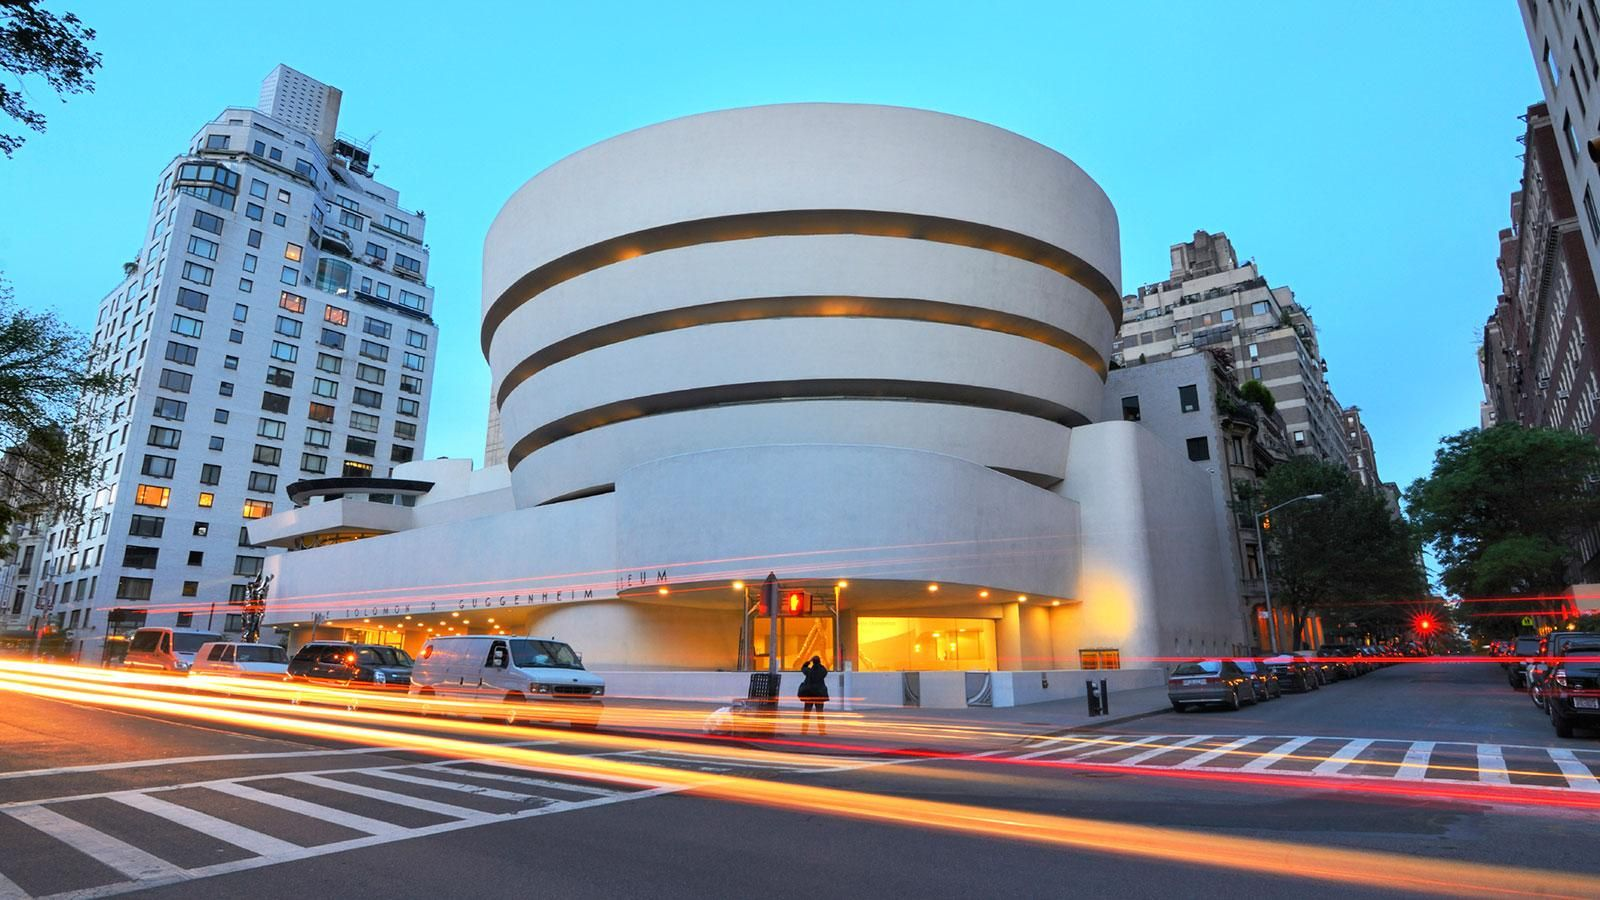 21 Oct 1959: Guggenheim Museum opens - a masterpiece wrapped around an art collection